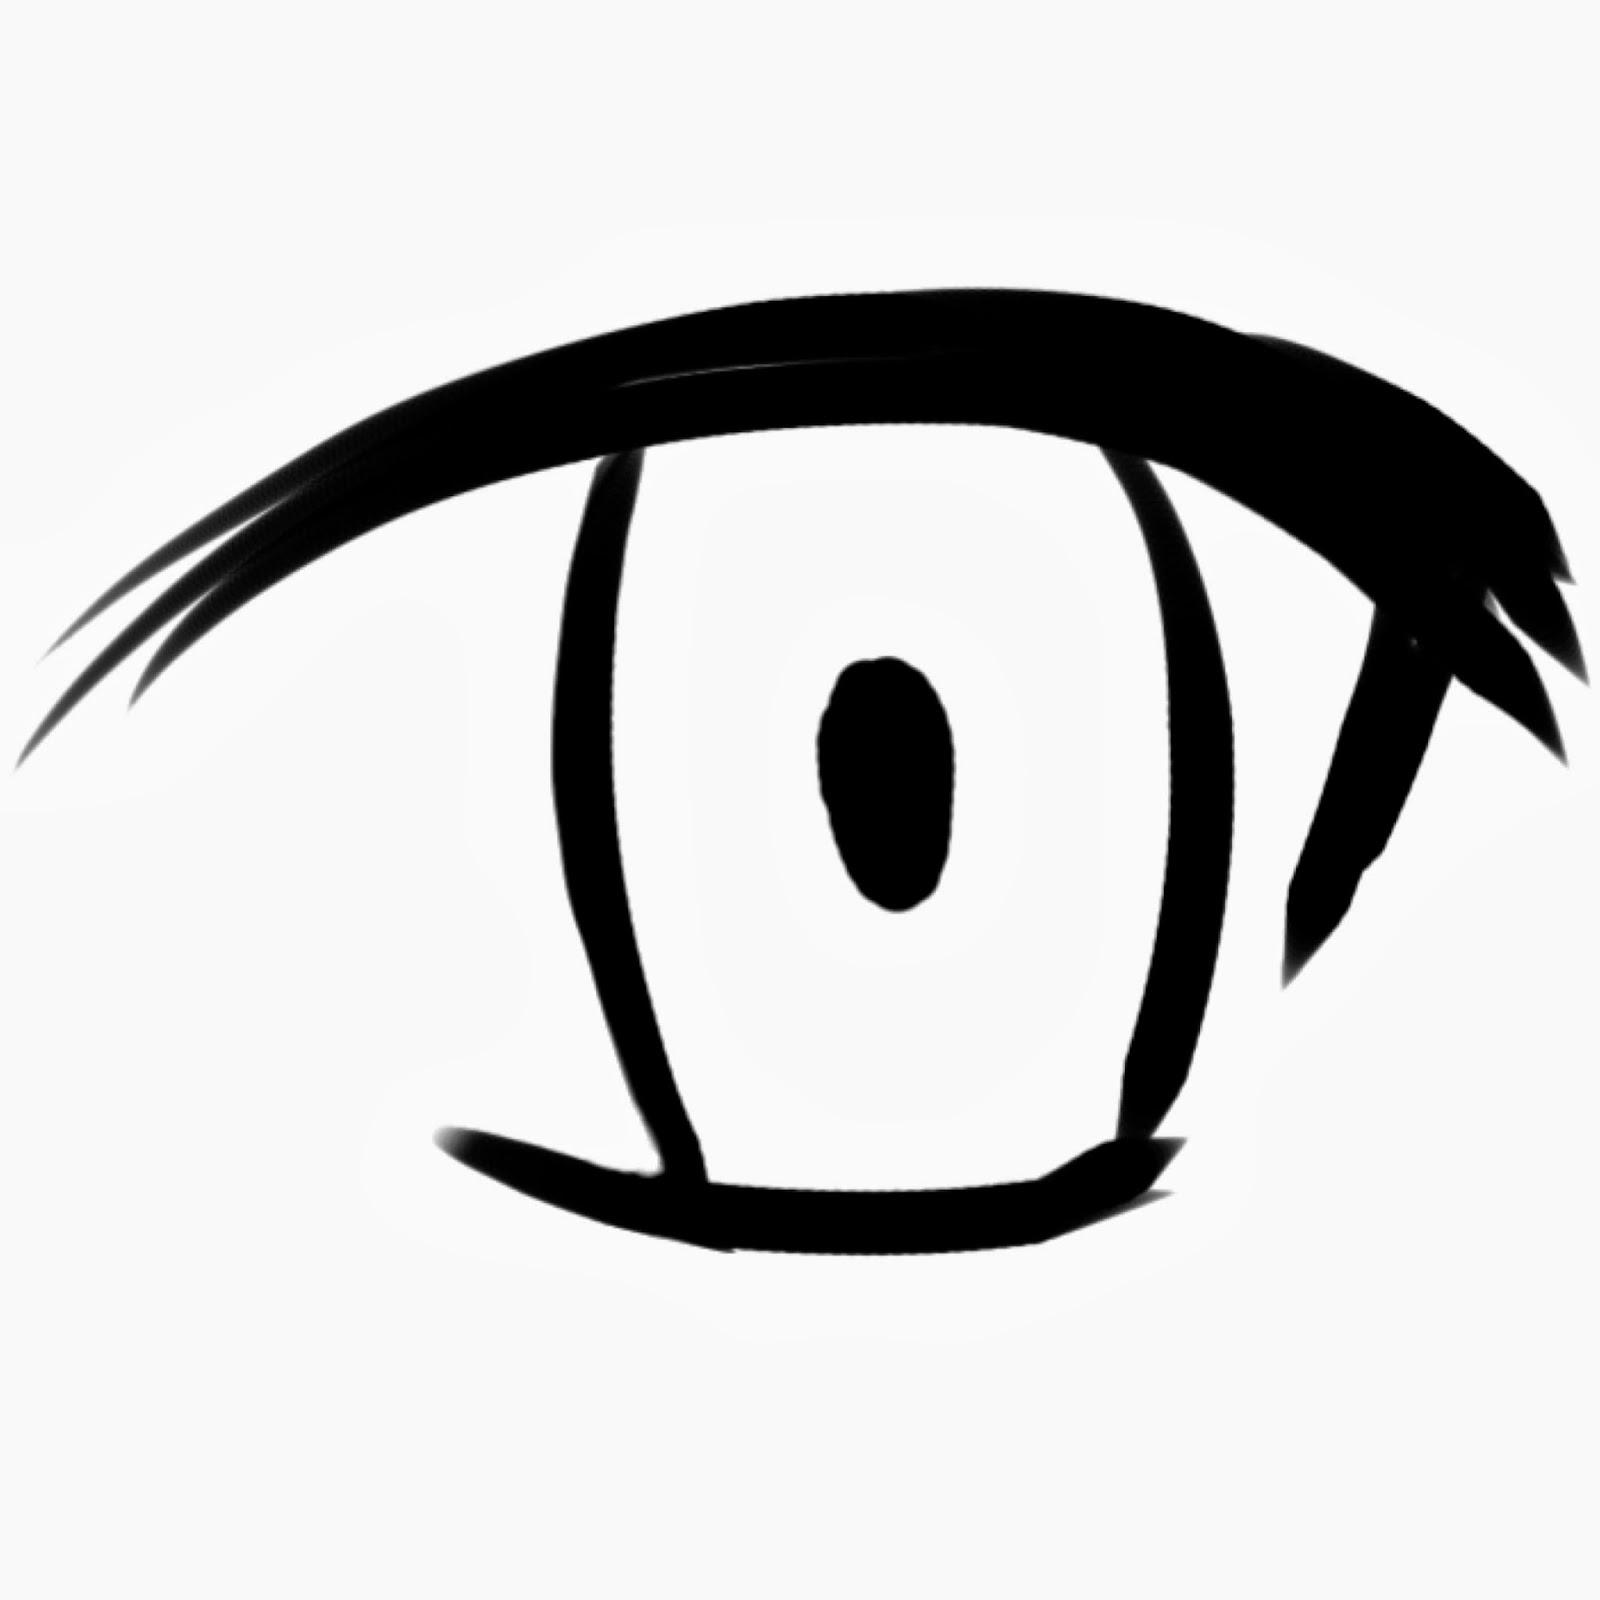 JapAnime How To Color Anime Eyes Bagaimana Cara